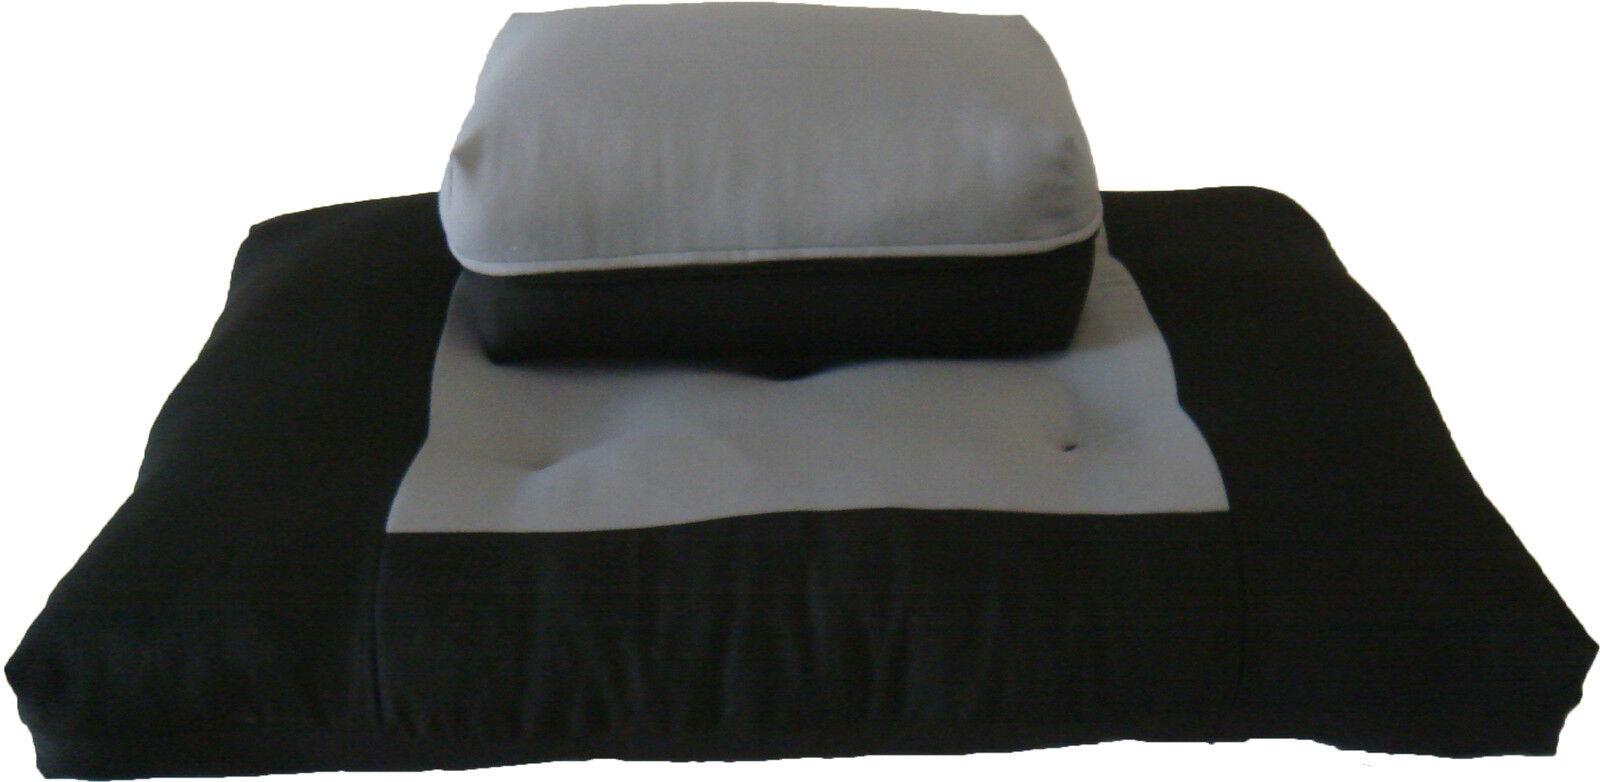 Zafu Zabuton Set, Relaxing Yoga Meditation Cotton Cushions, Mats Black/Gray